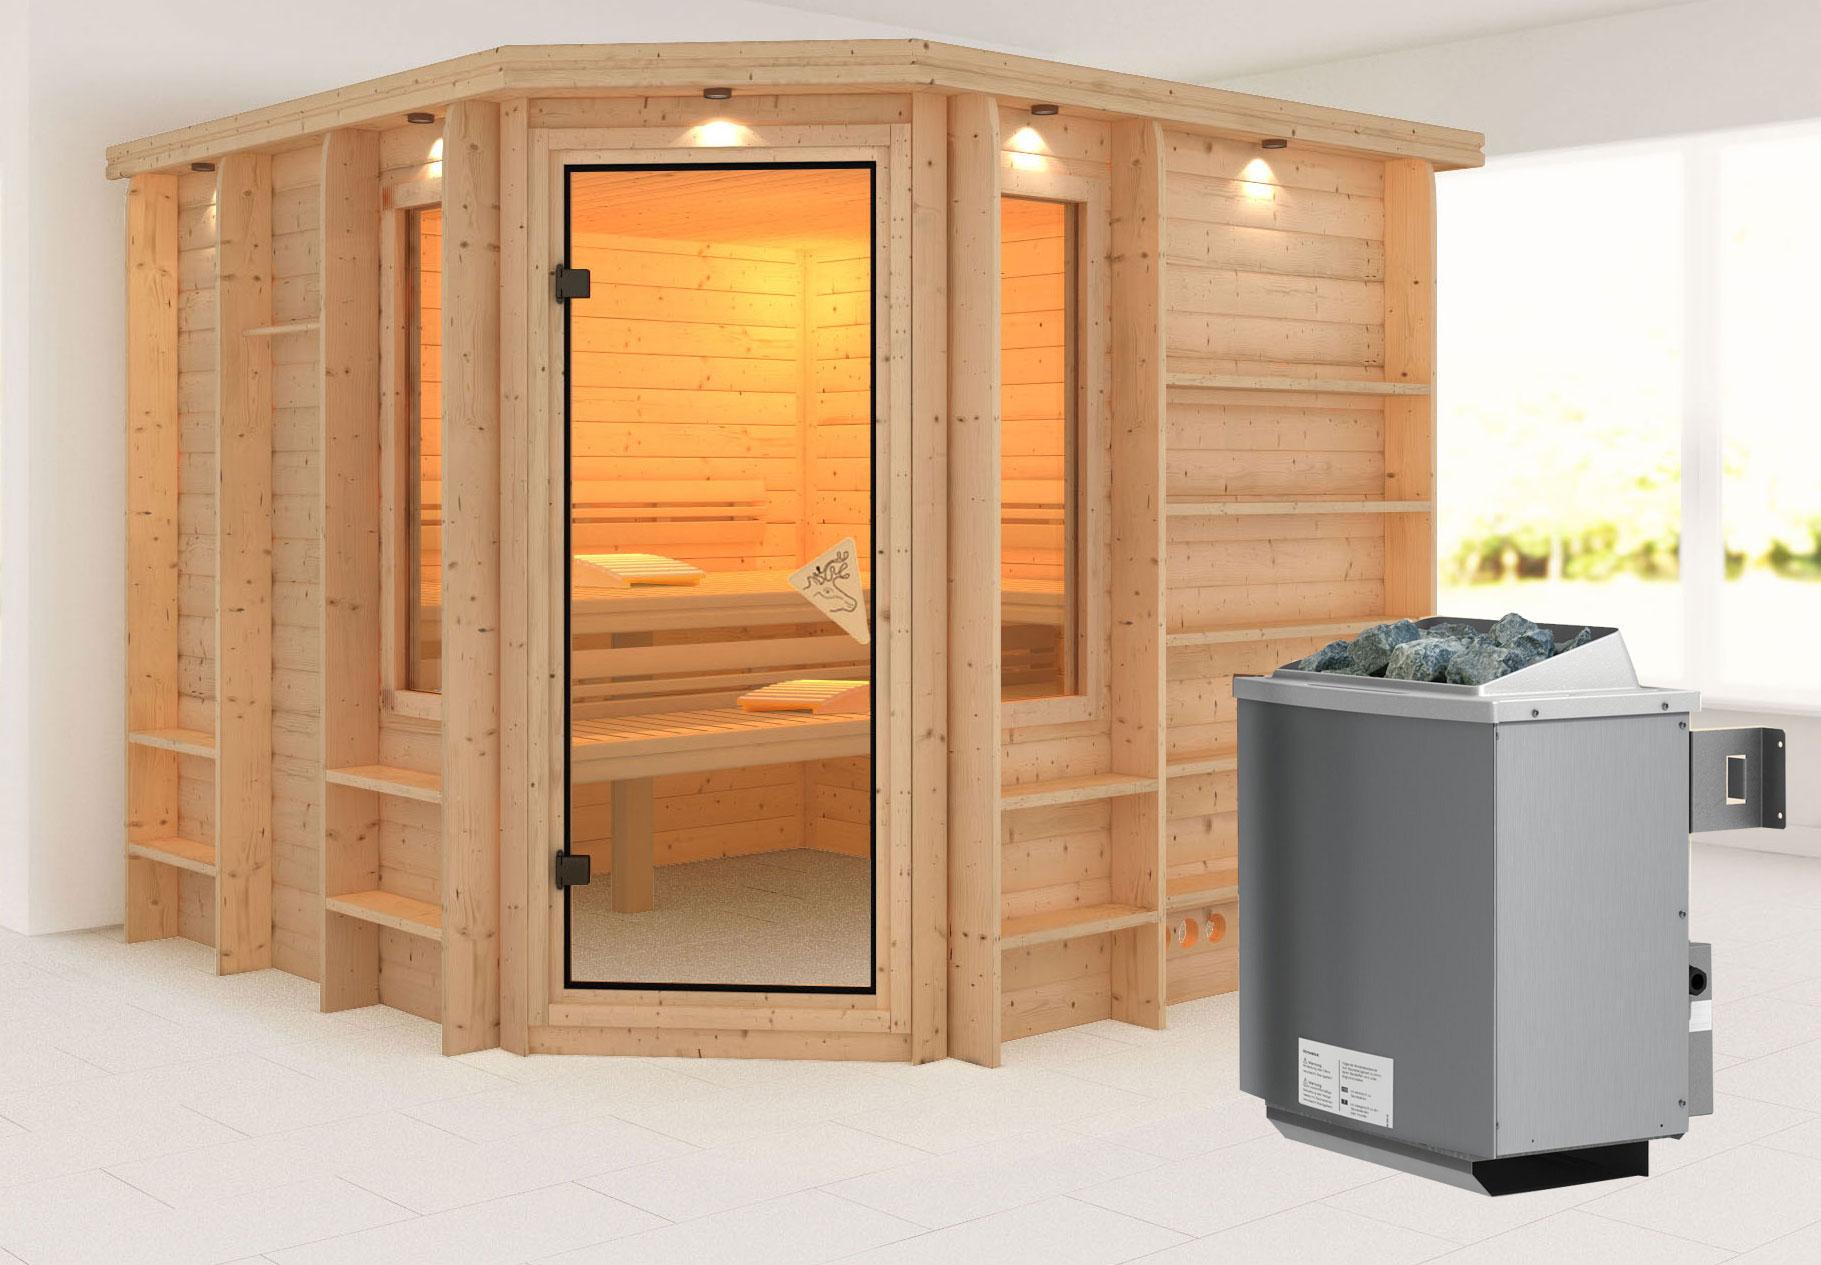 Karibu Sauna Marona 40mm Dachkranz + Ofen 9kW intern classic Tür Bild 1